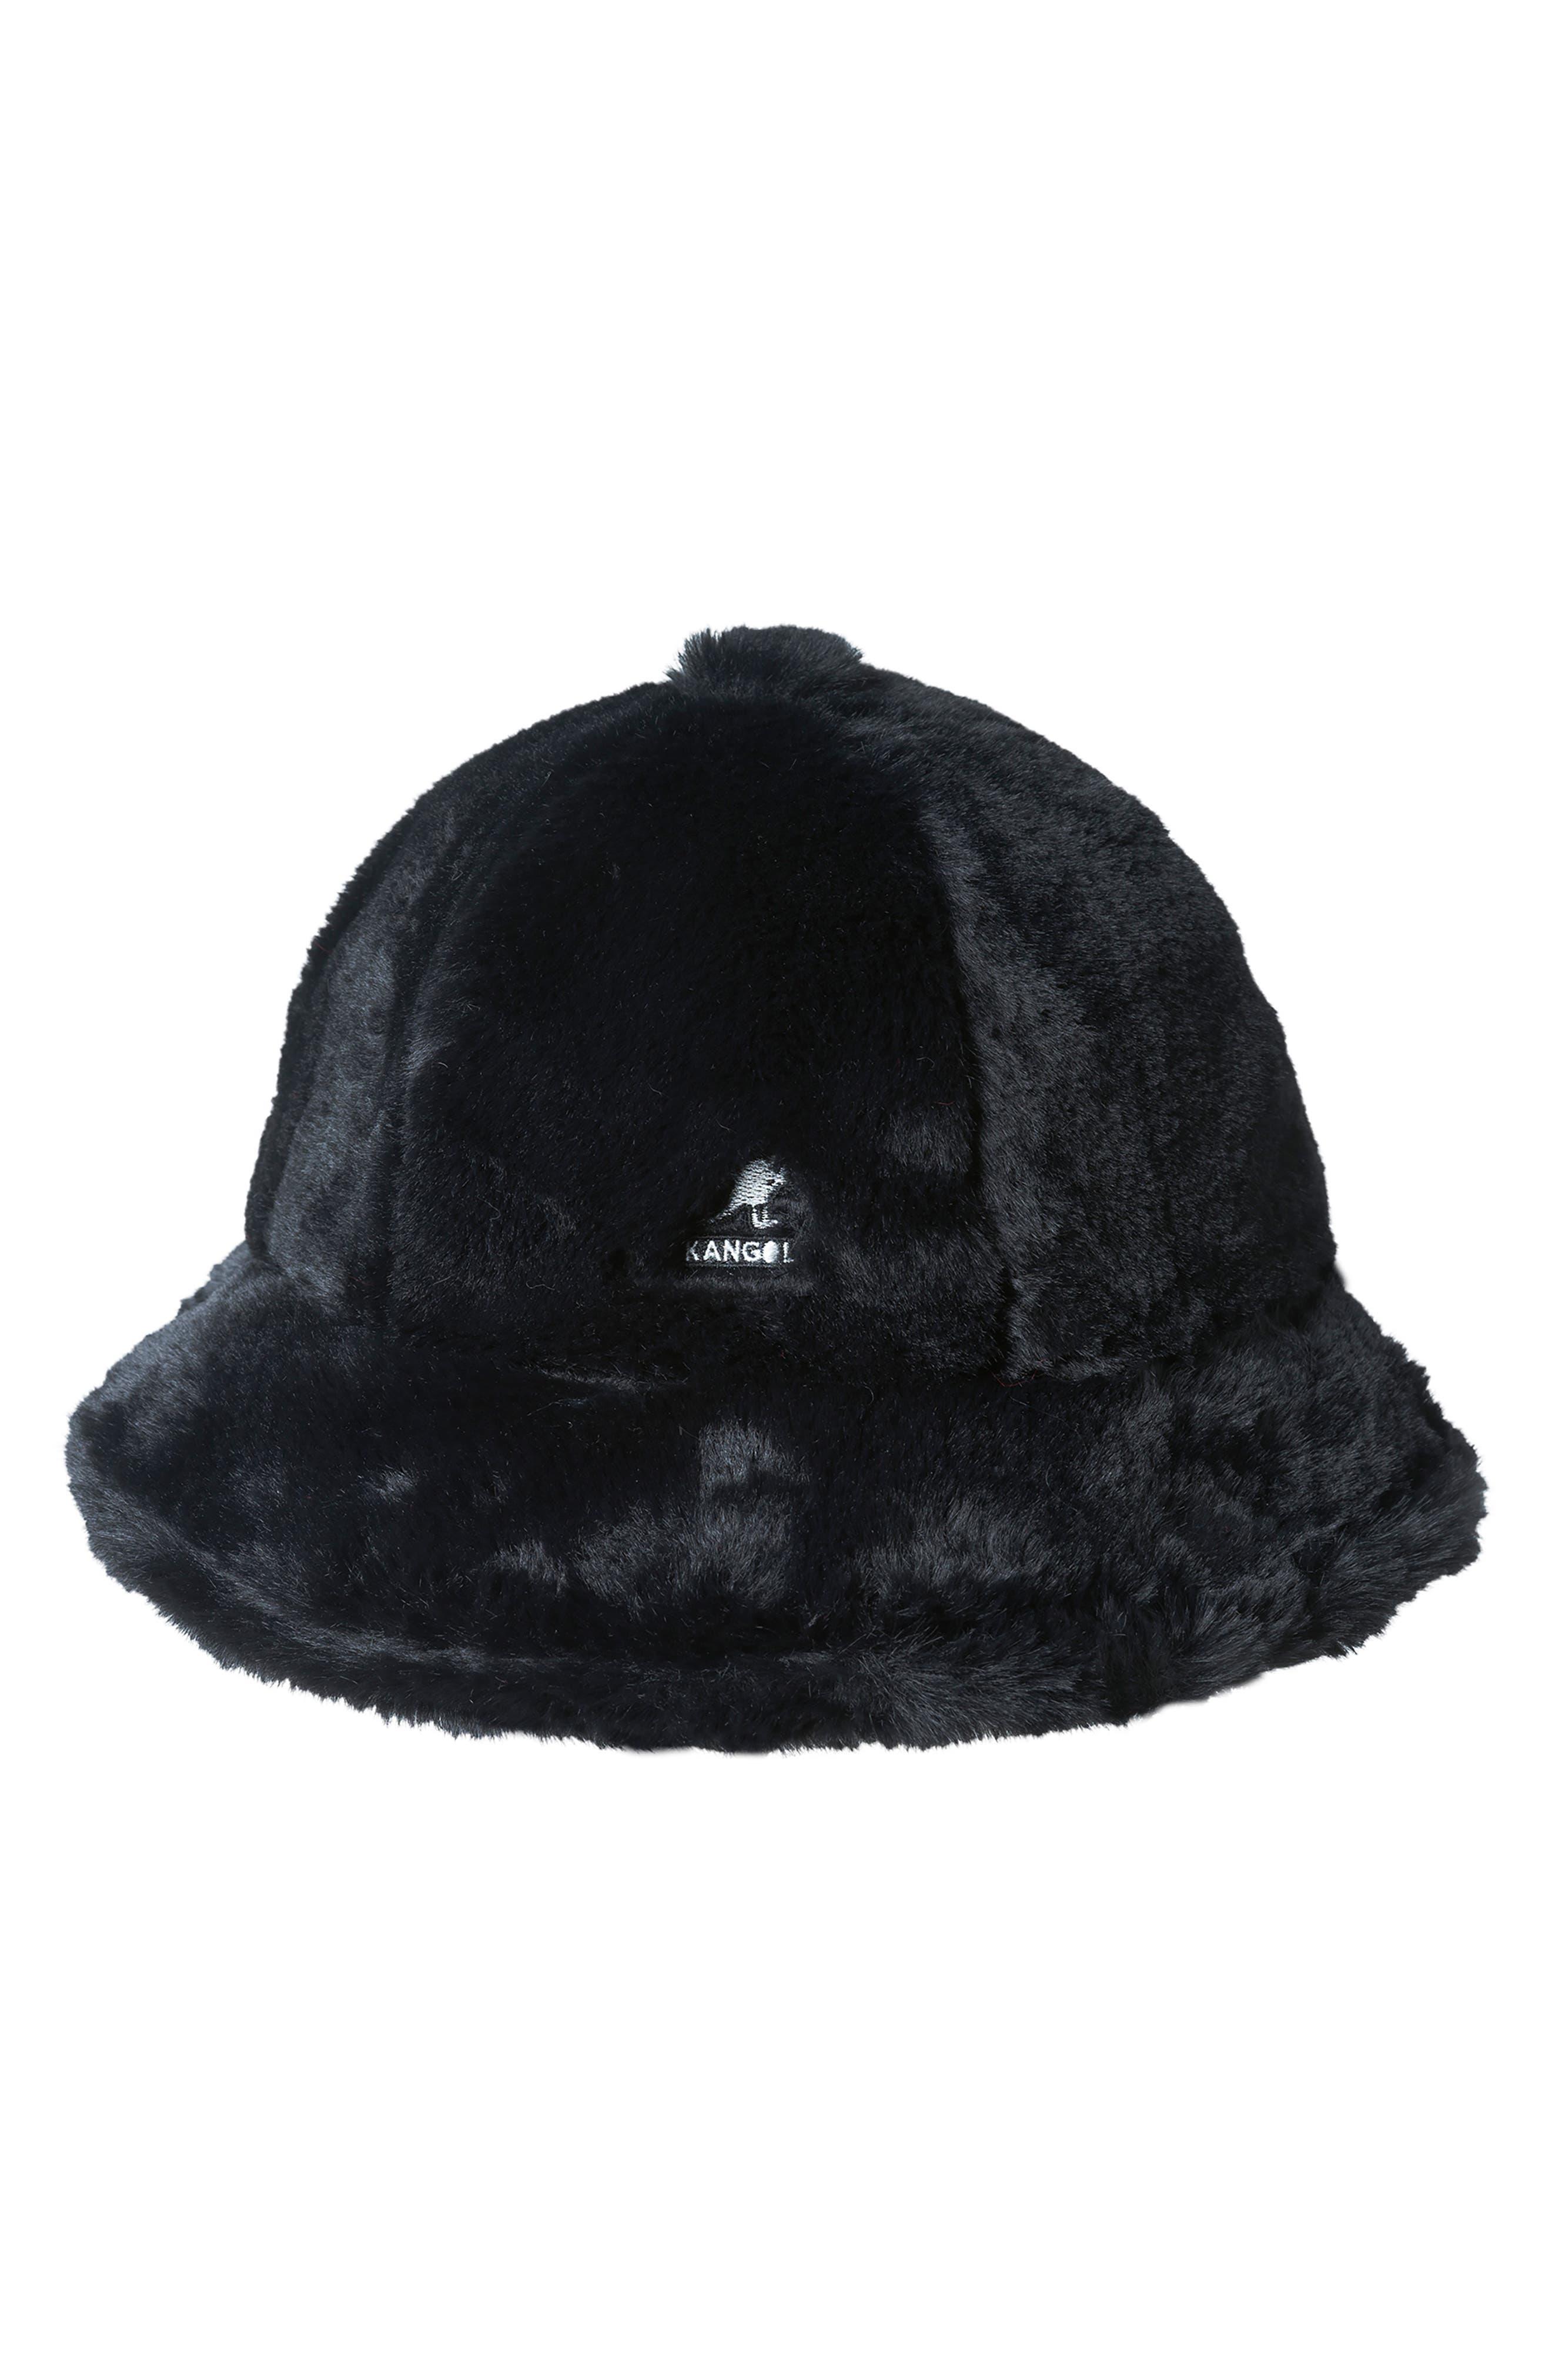 KANGOL Faux Fur Casual Bucket Hat - Black